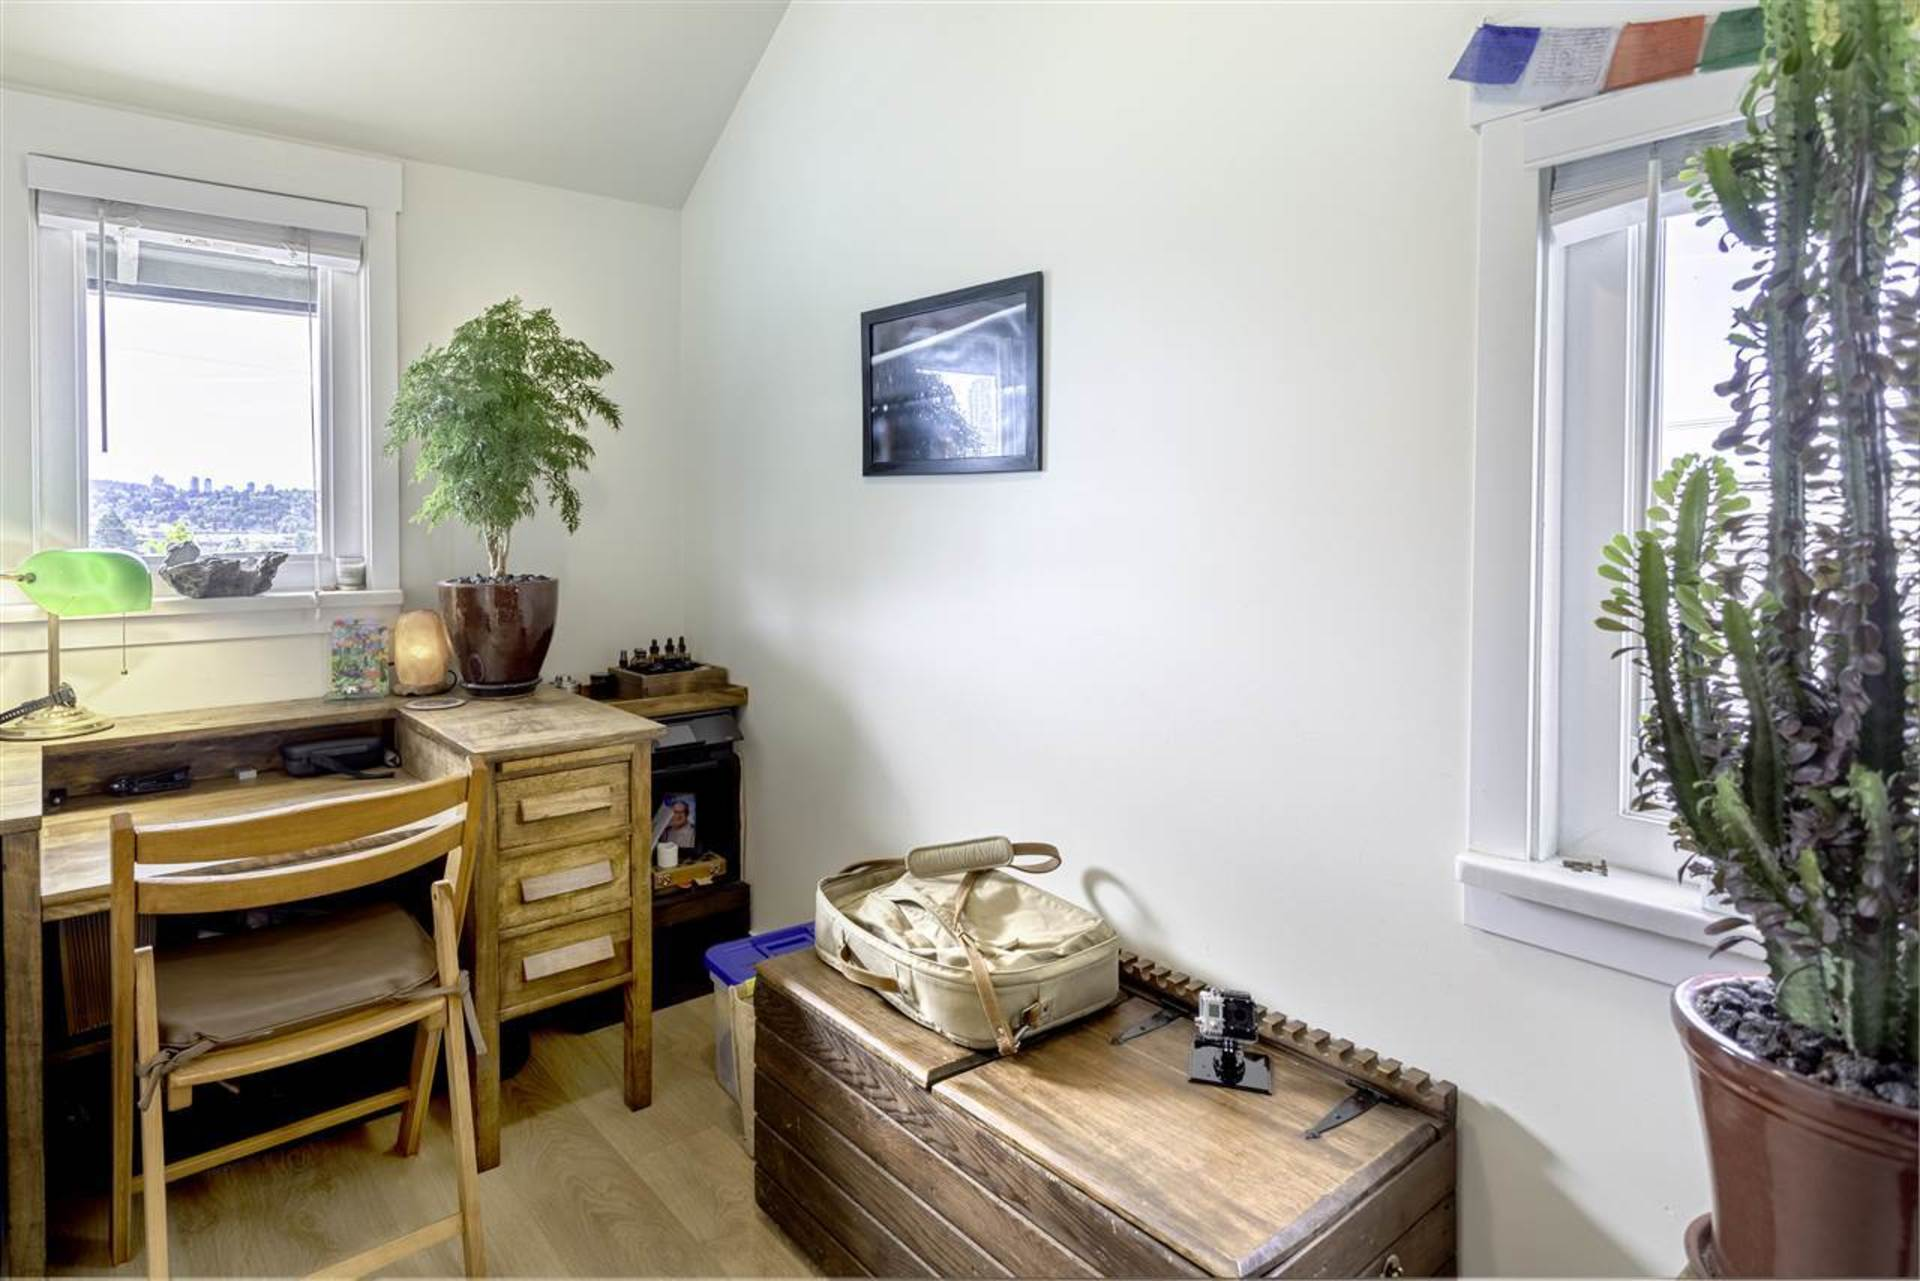 3912-parker-street-willingdon-heights-burnaby-north-22 at 3912 Parker Street, Willingdon Heights, Burnaby North